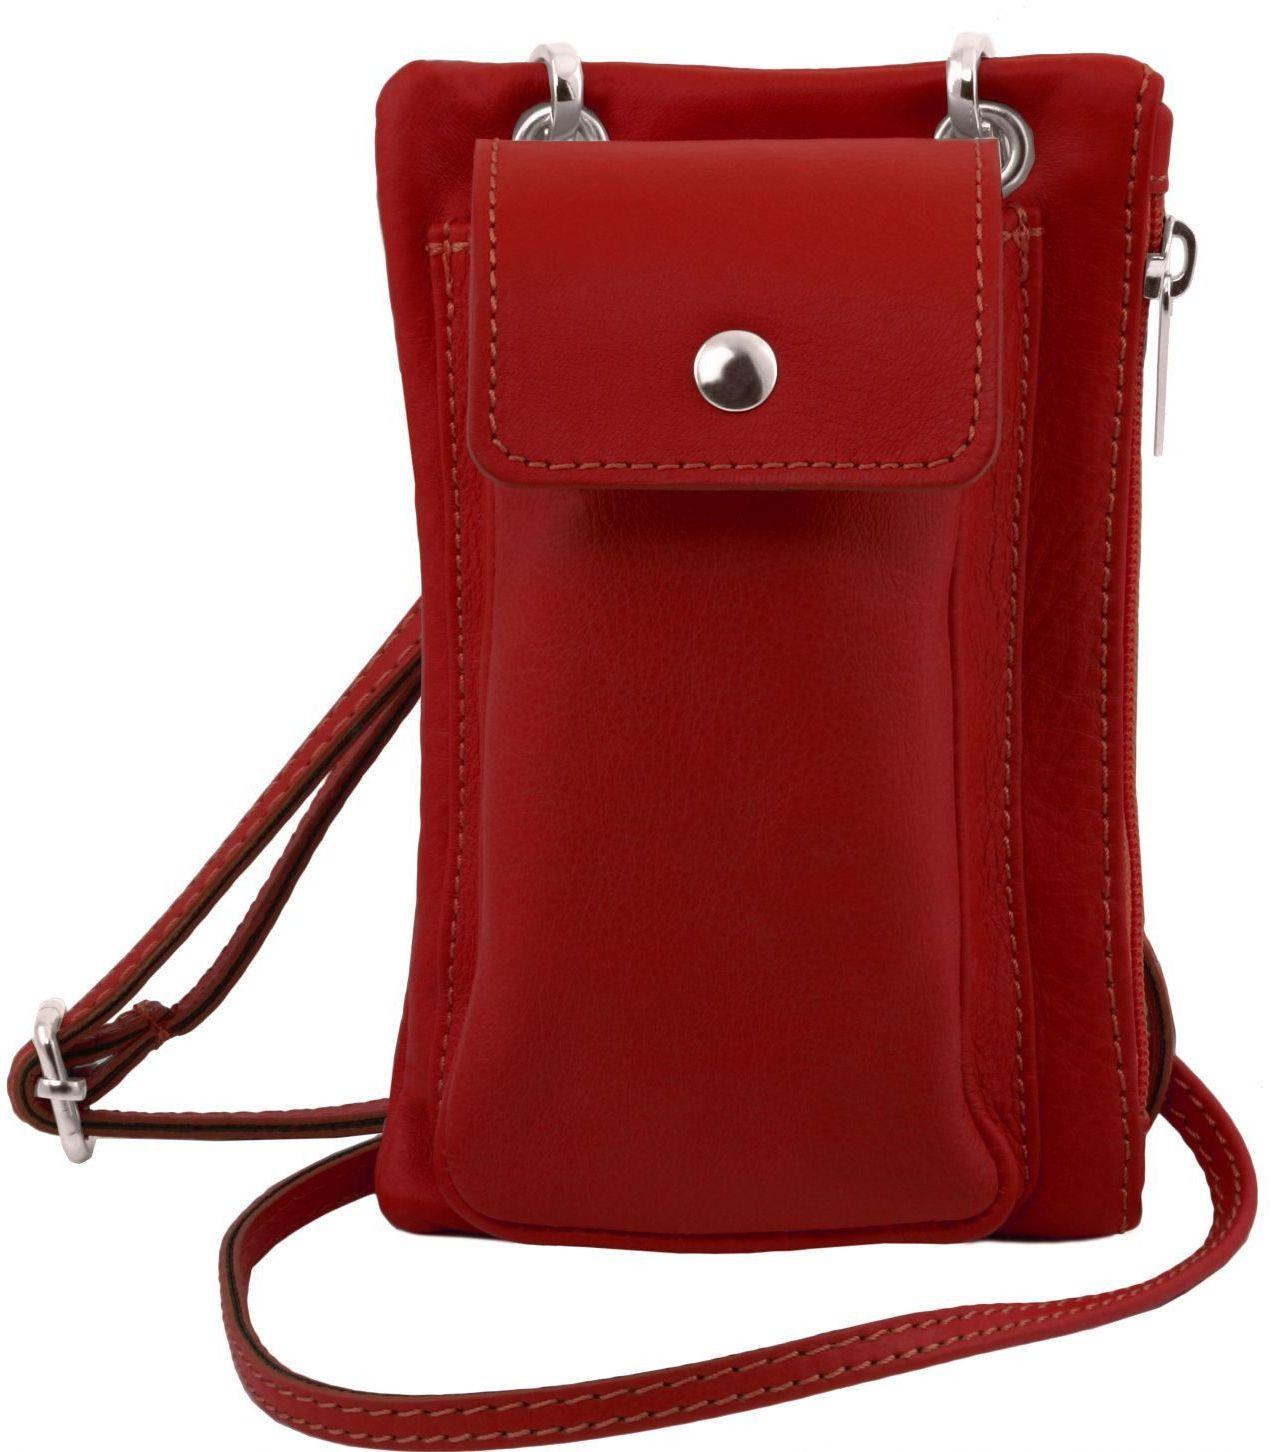 Unisex Τσαντάκι Δερμάτινο Mini Cross TL141423 Κόκκινο Tuscany Leather γυναίκα   τσάντες ώμου   χειρός